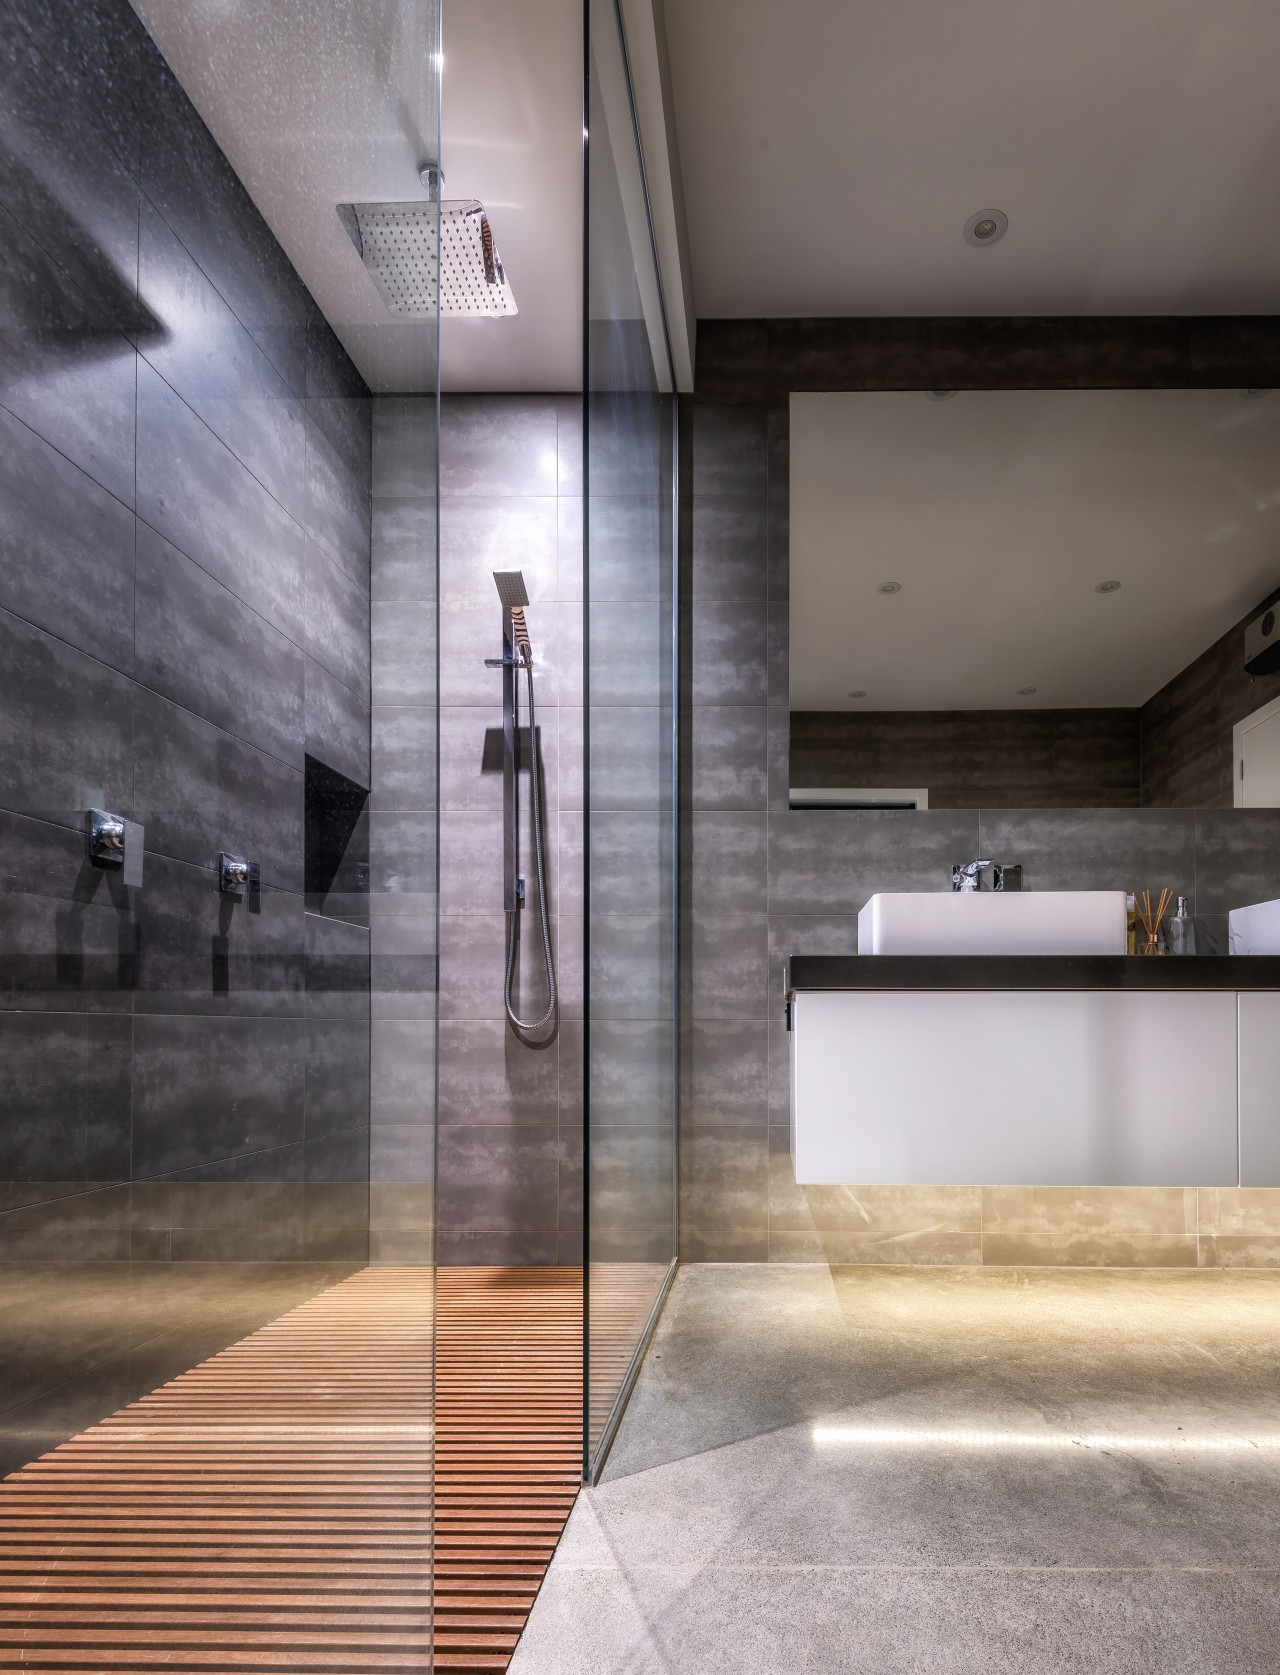 Lightly patterned grey tiles in this bathroom tie architecture, floor, flooring, interior design, Kirsty Davis, Master suite, walk in shower, double vanity